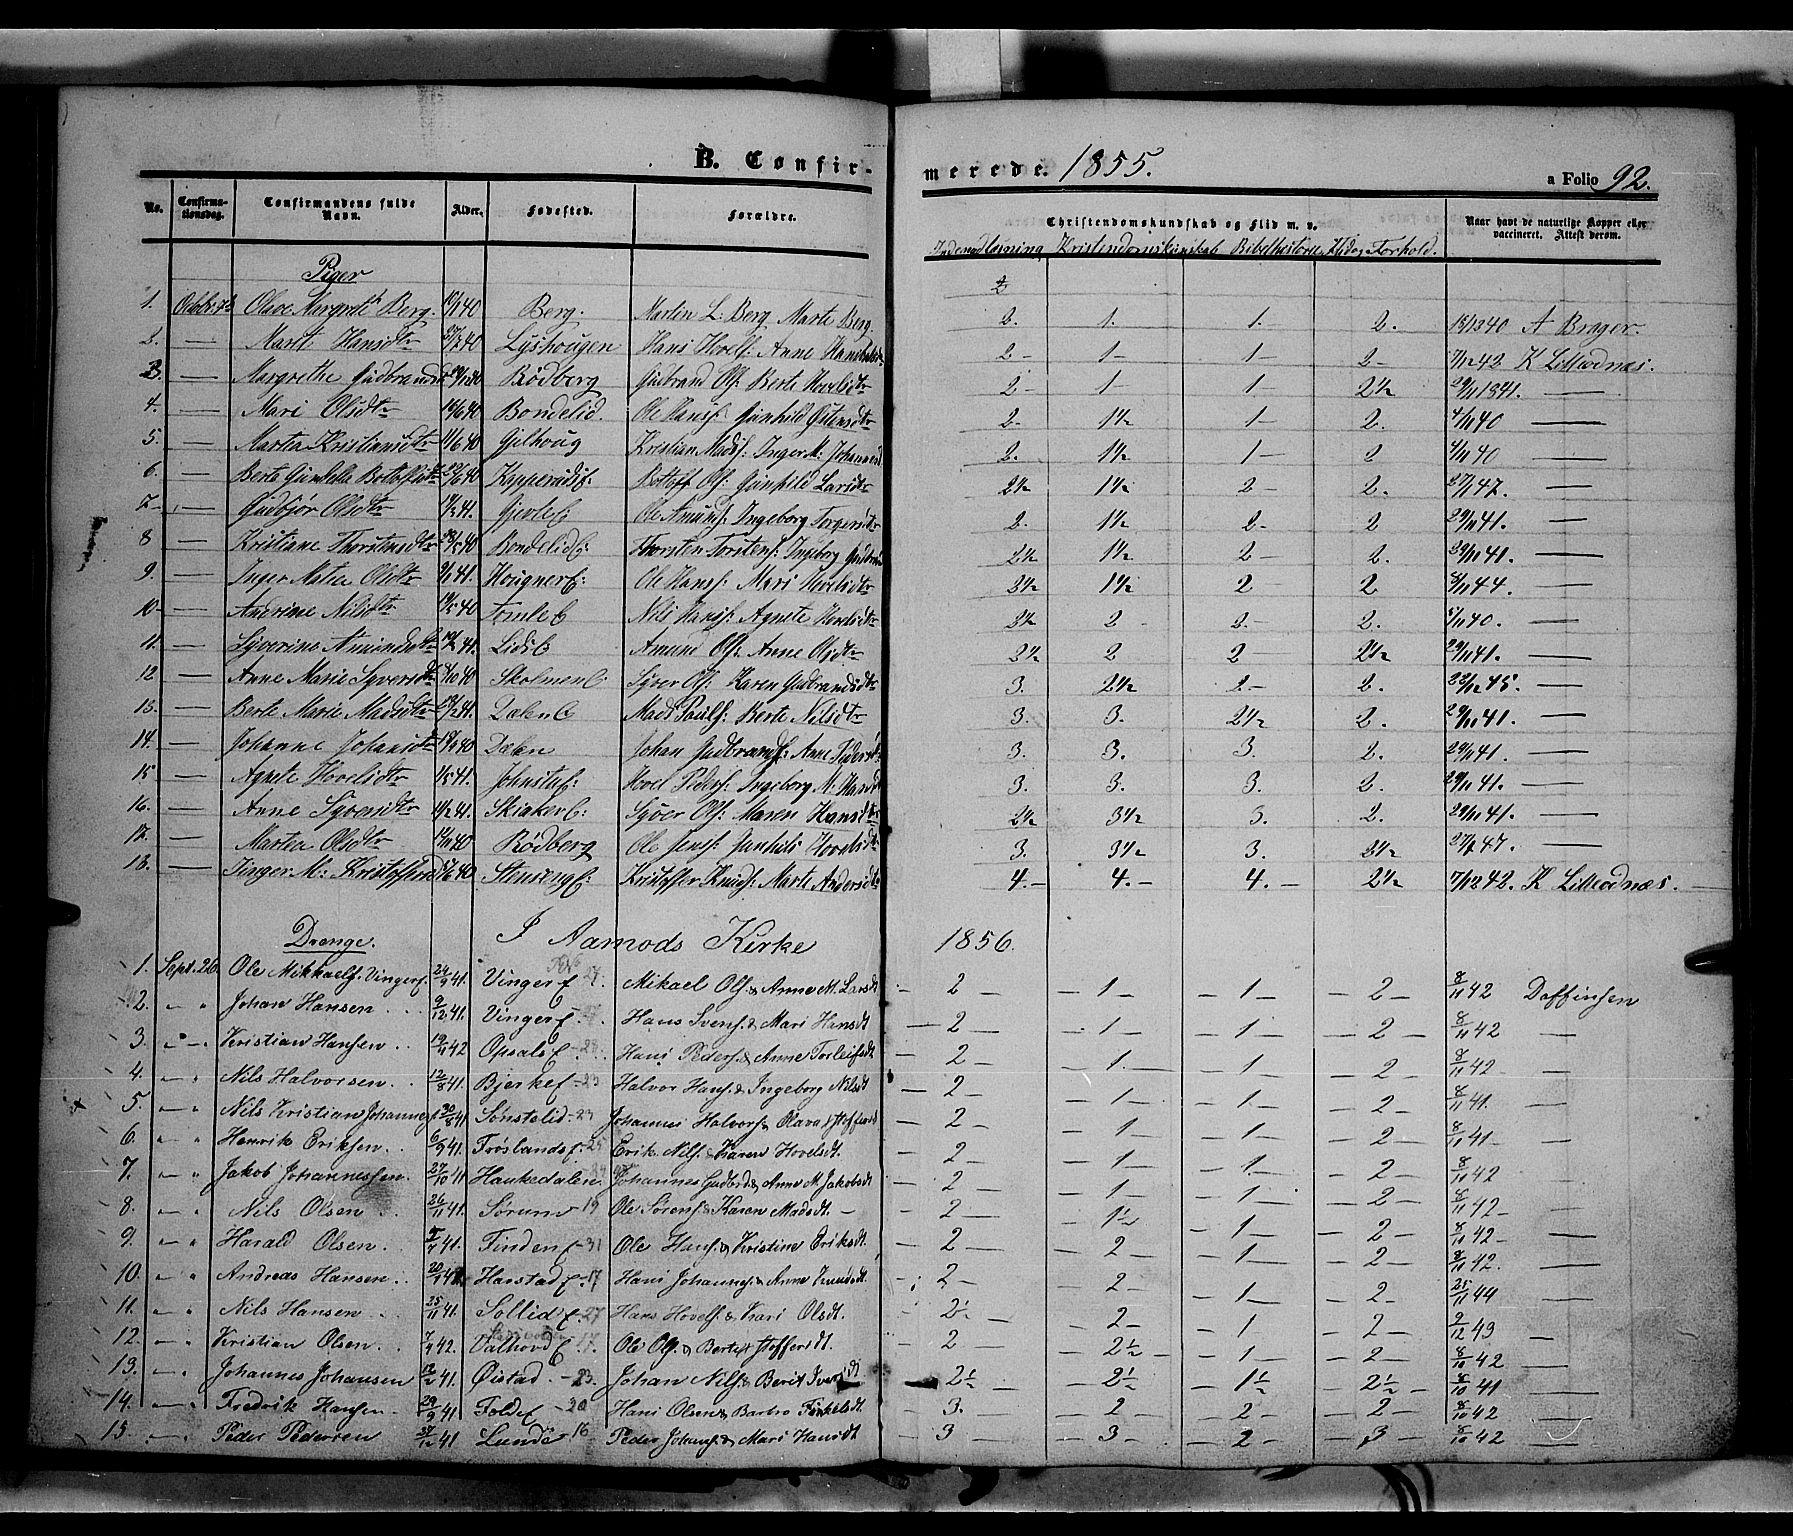 SAH, Land prestekontor, Ministerialbok nr. 10, 1847-1859, s. 92